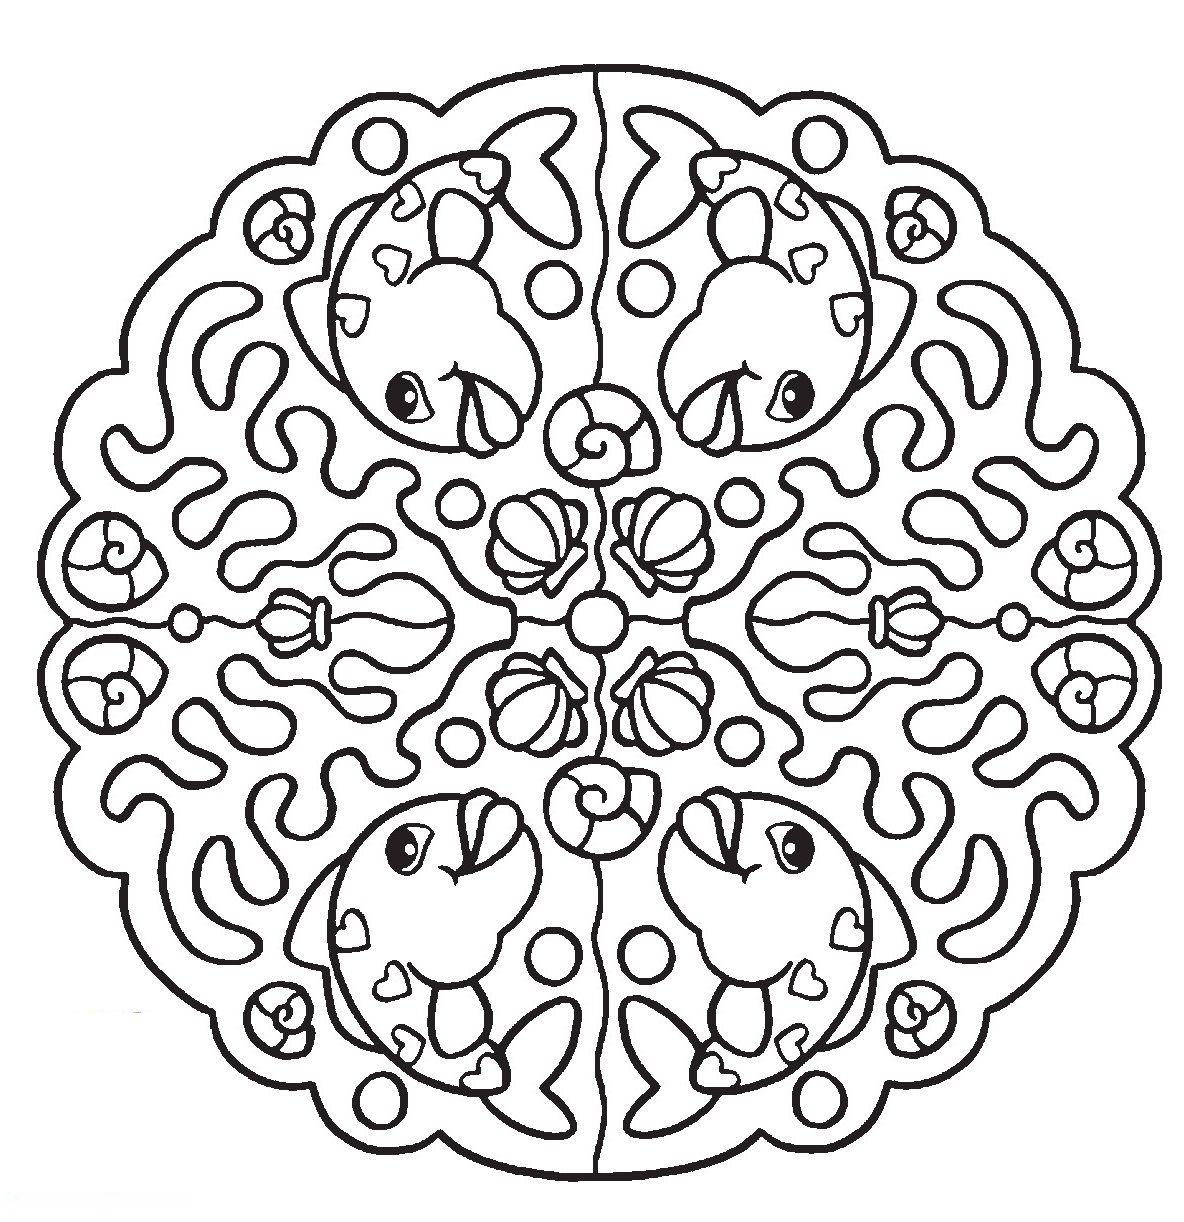 Mandala Vissen Mandala Coloring Pages Coloring Pages Mandala Coloring